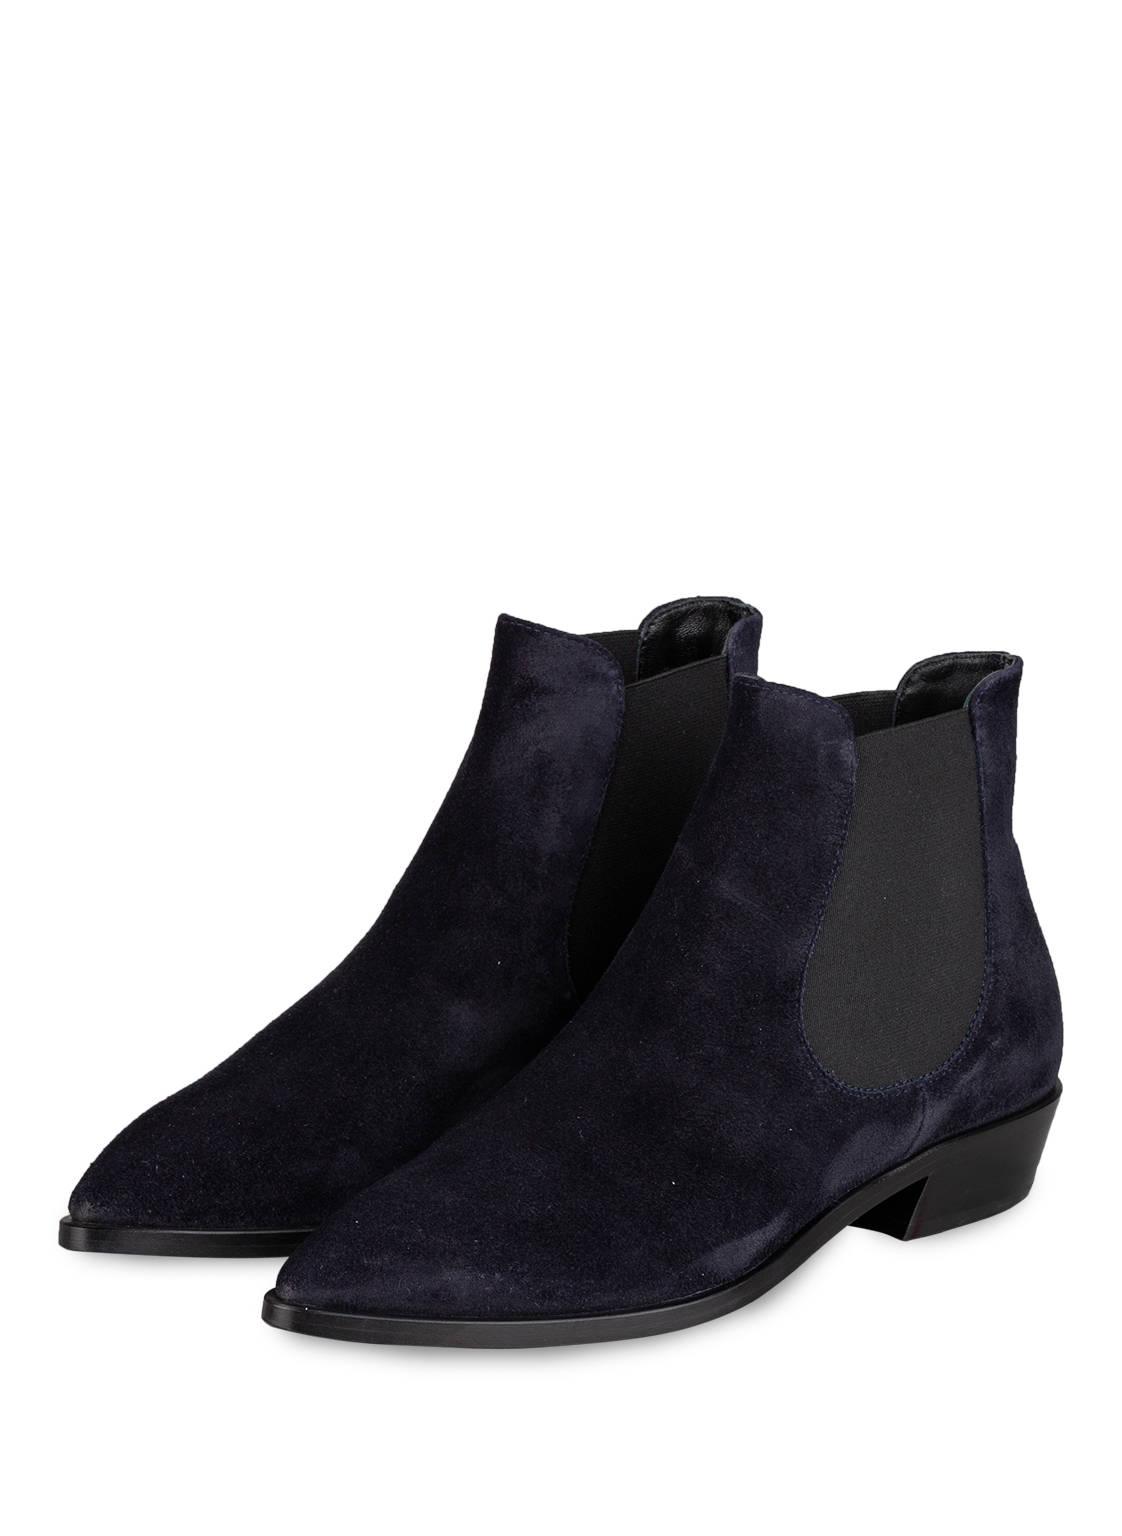 Image of Agl Attilio Giusti Leombruni Chelsea-Boots blau